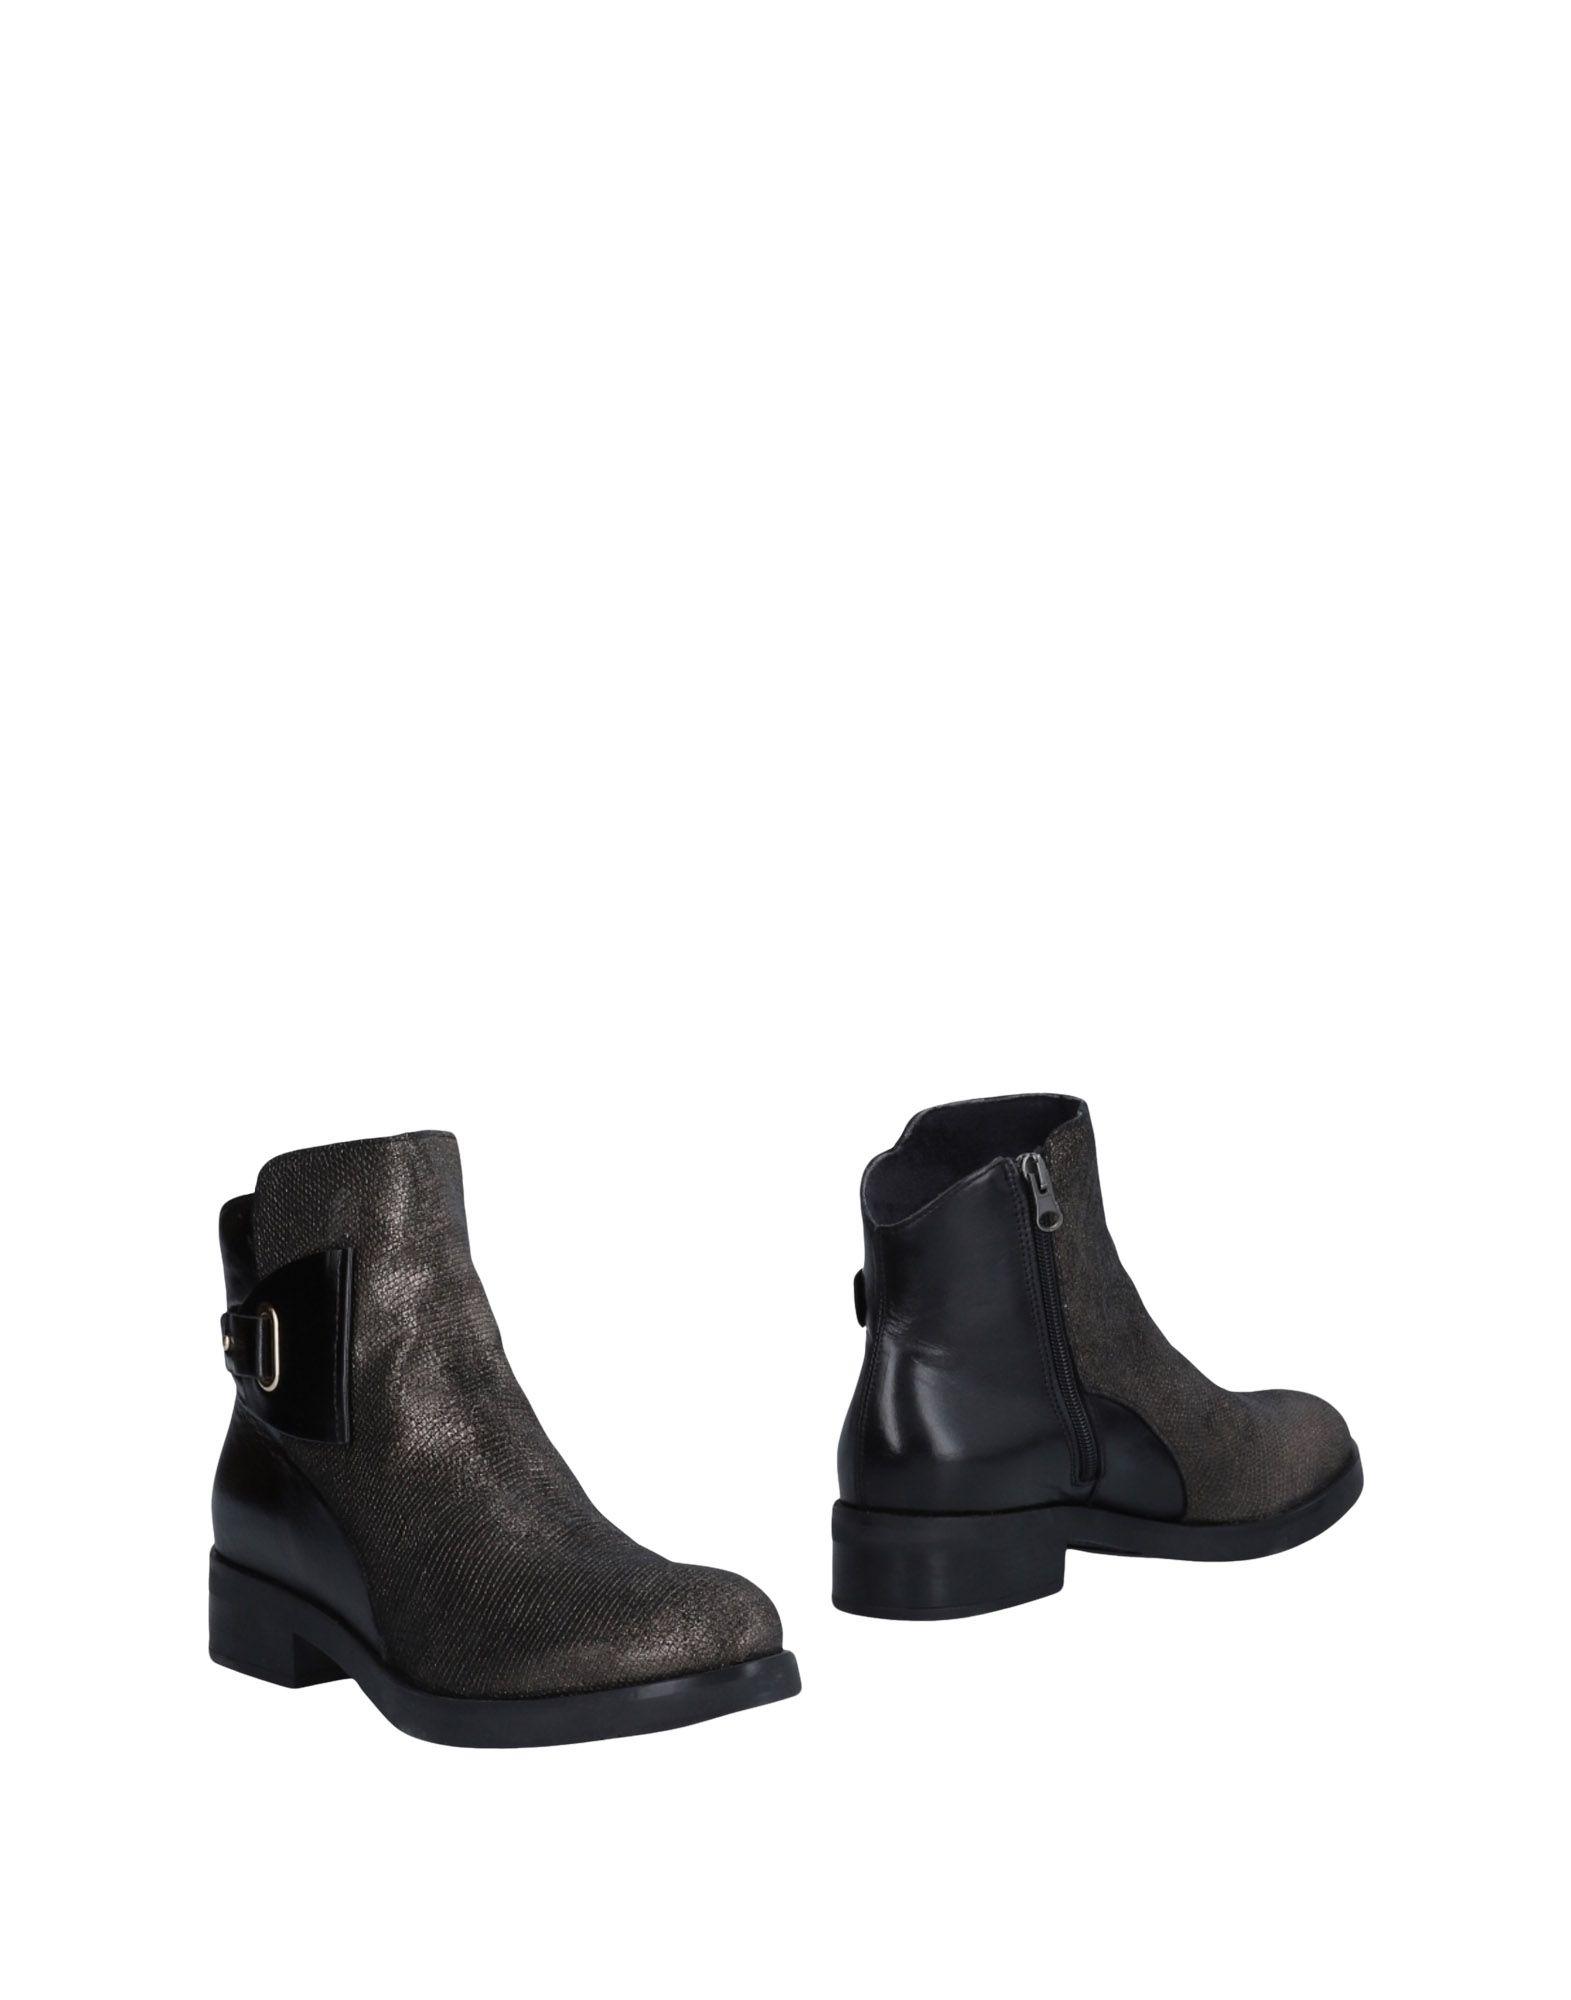 LA FEE MARABOUTEE Полусапоги и высокие ботинки la fee maraboutee полусапоги и высокие ботинки